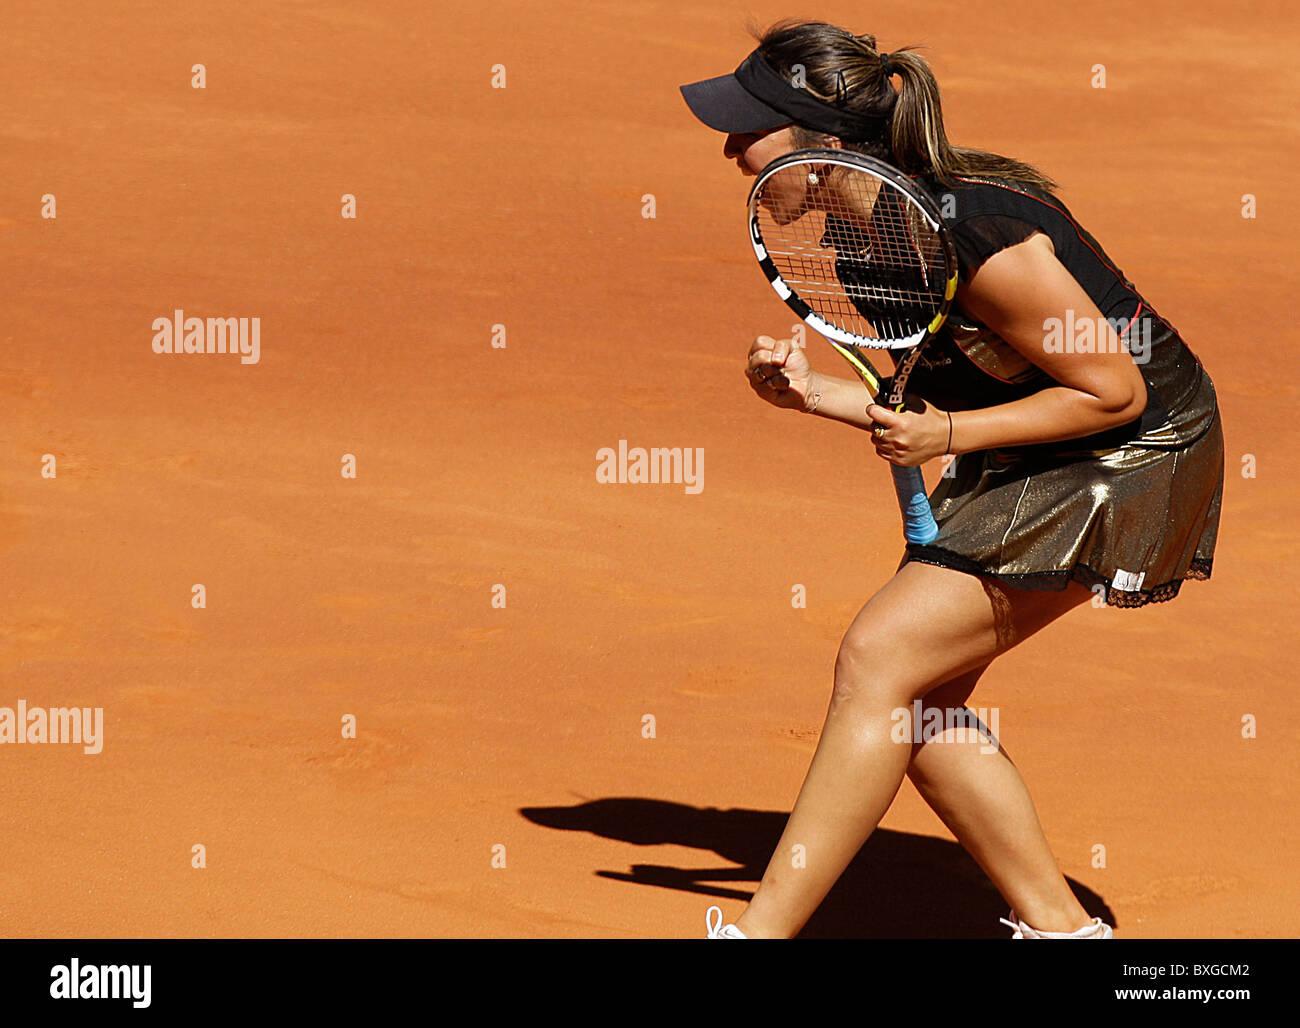 Aravane rezai fra in action against venus williams during the women s wta singles final